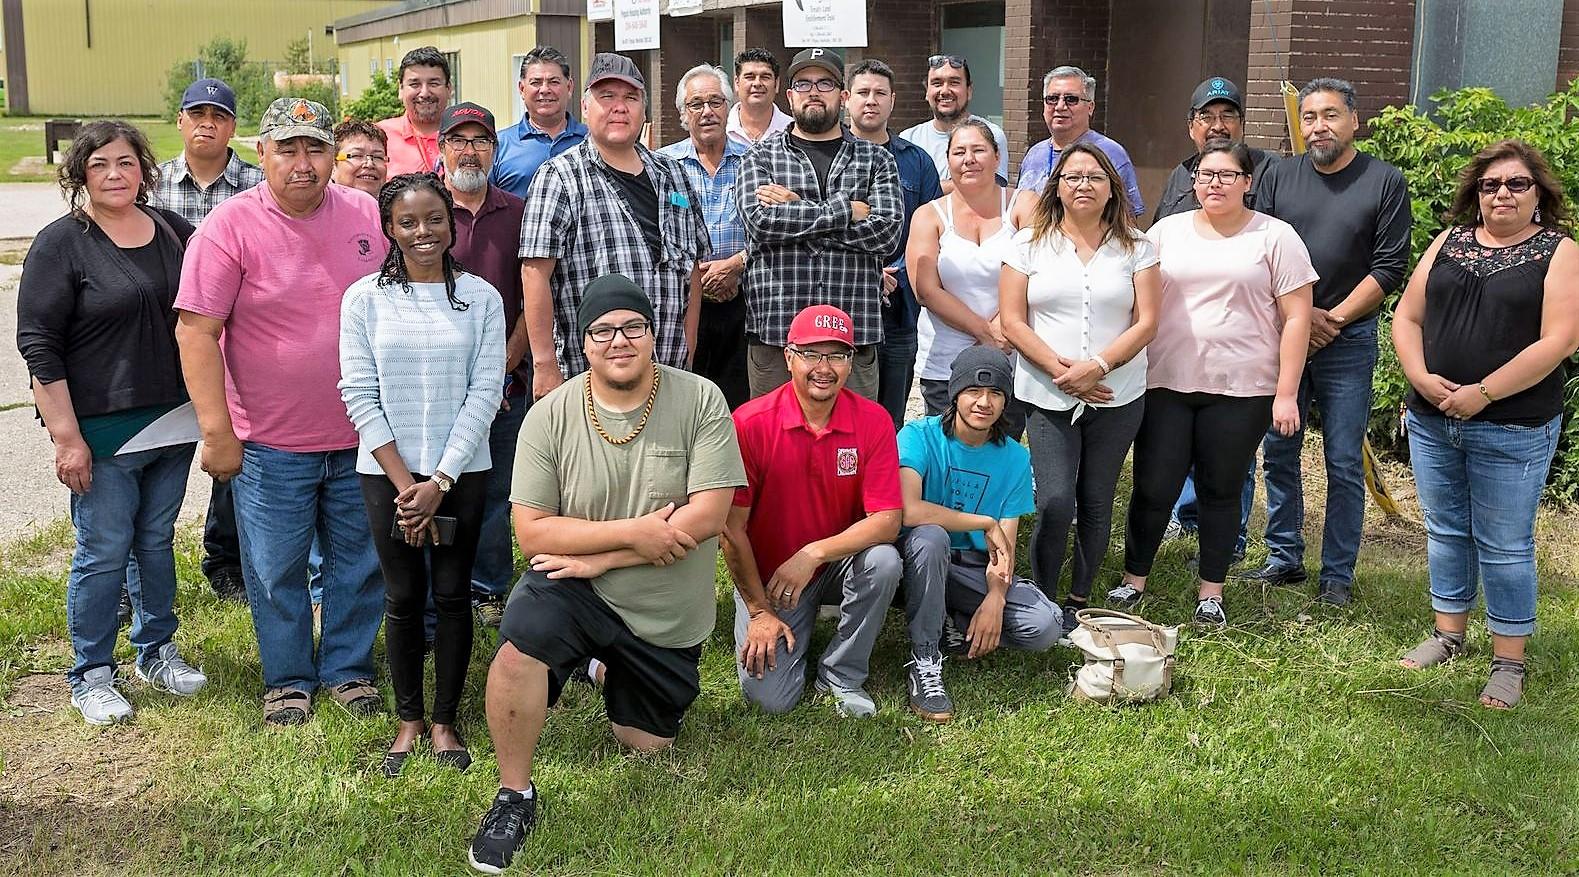 Manitoba Uske members group shot outside